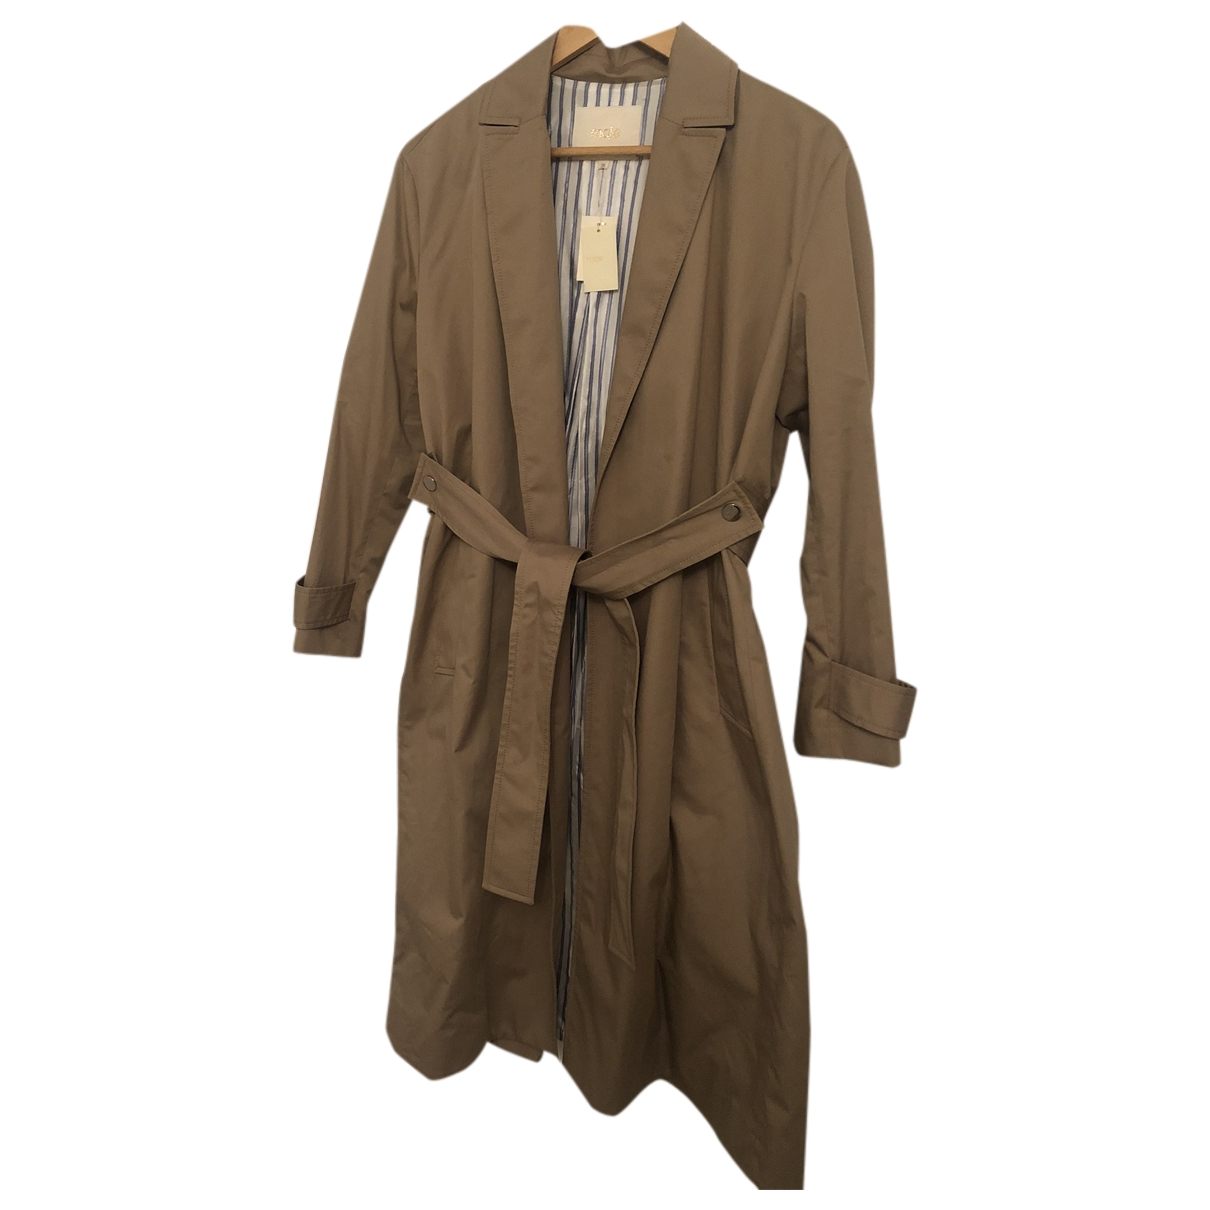 Maje \N Beige Cotton Trench coat for Women 36 FR